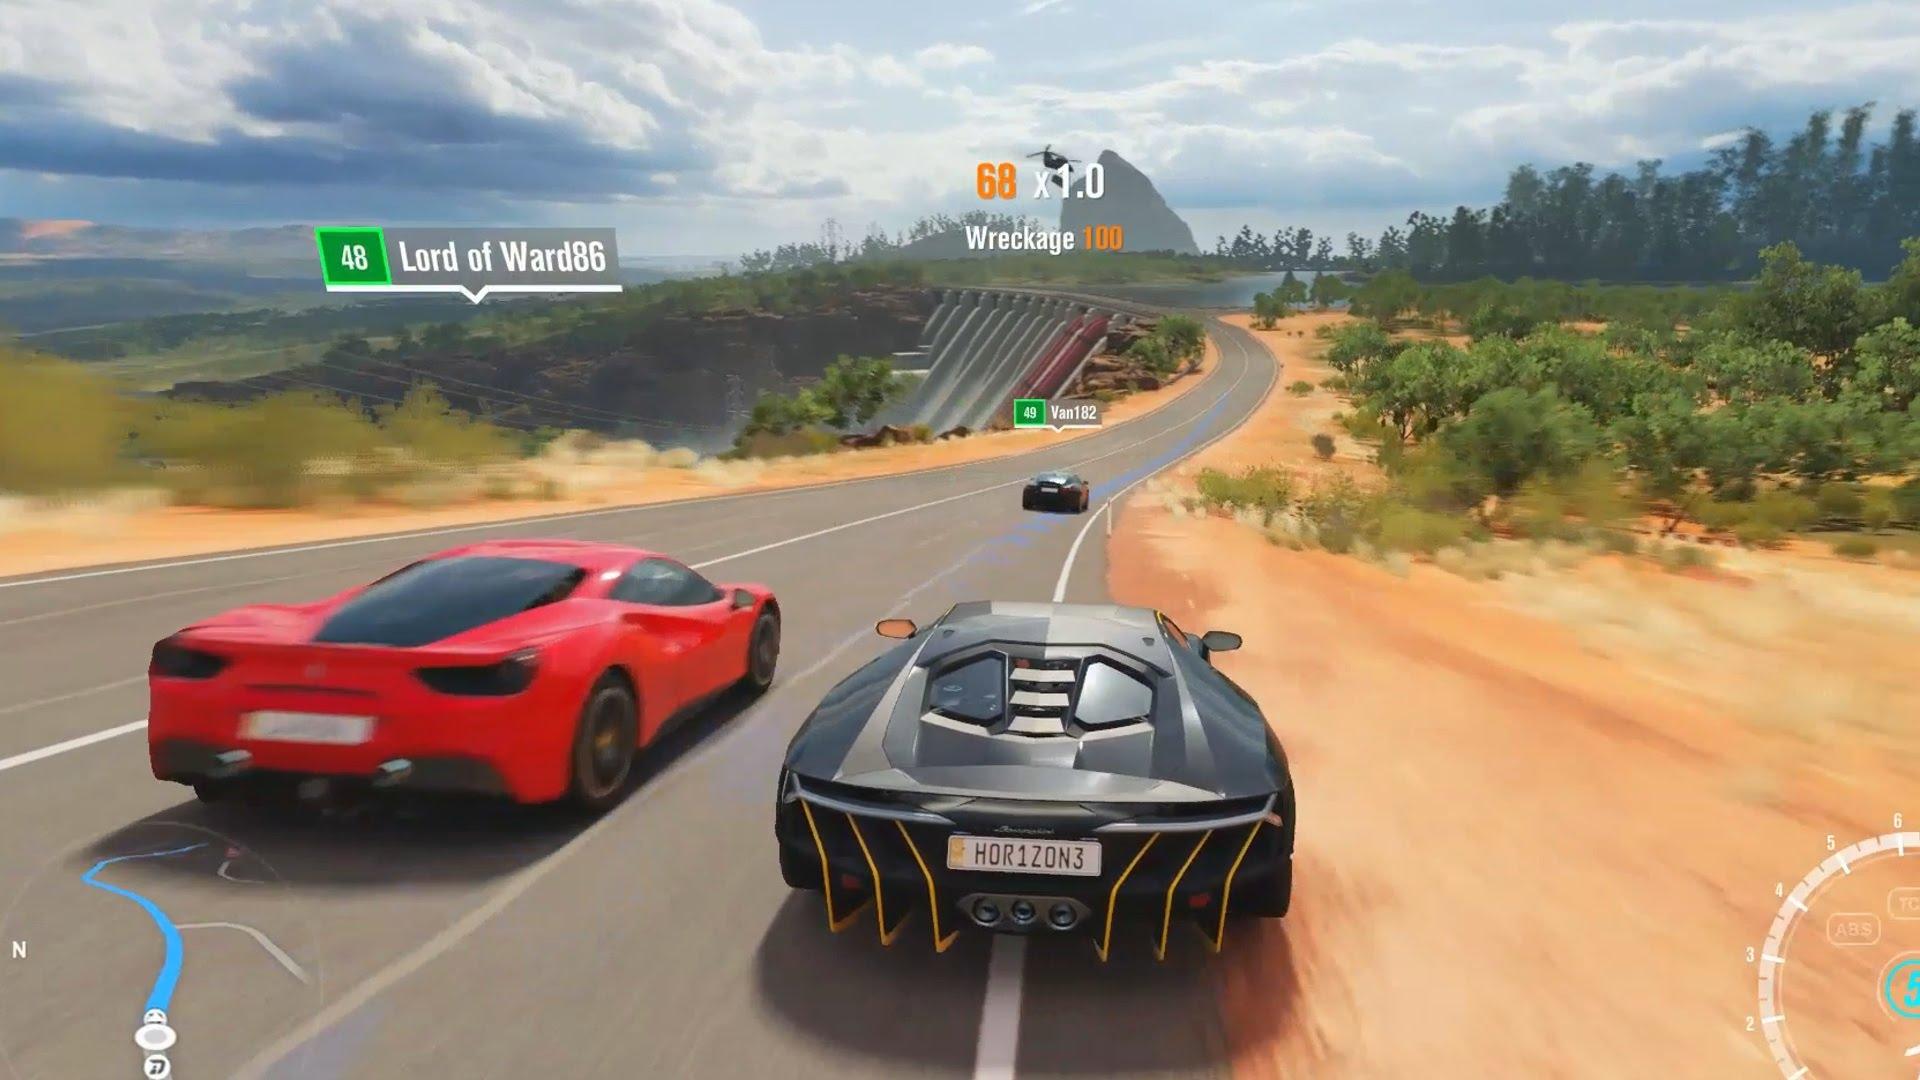 Forza Horizon 3, desenvolvido pela Playground Games